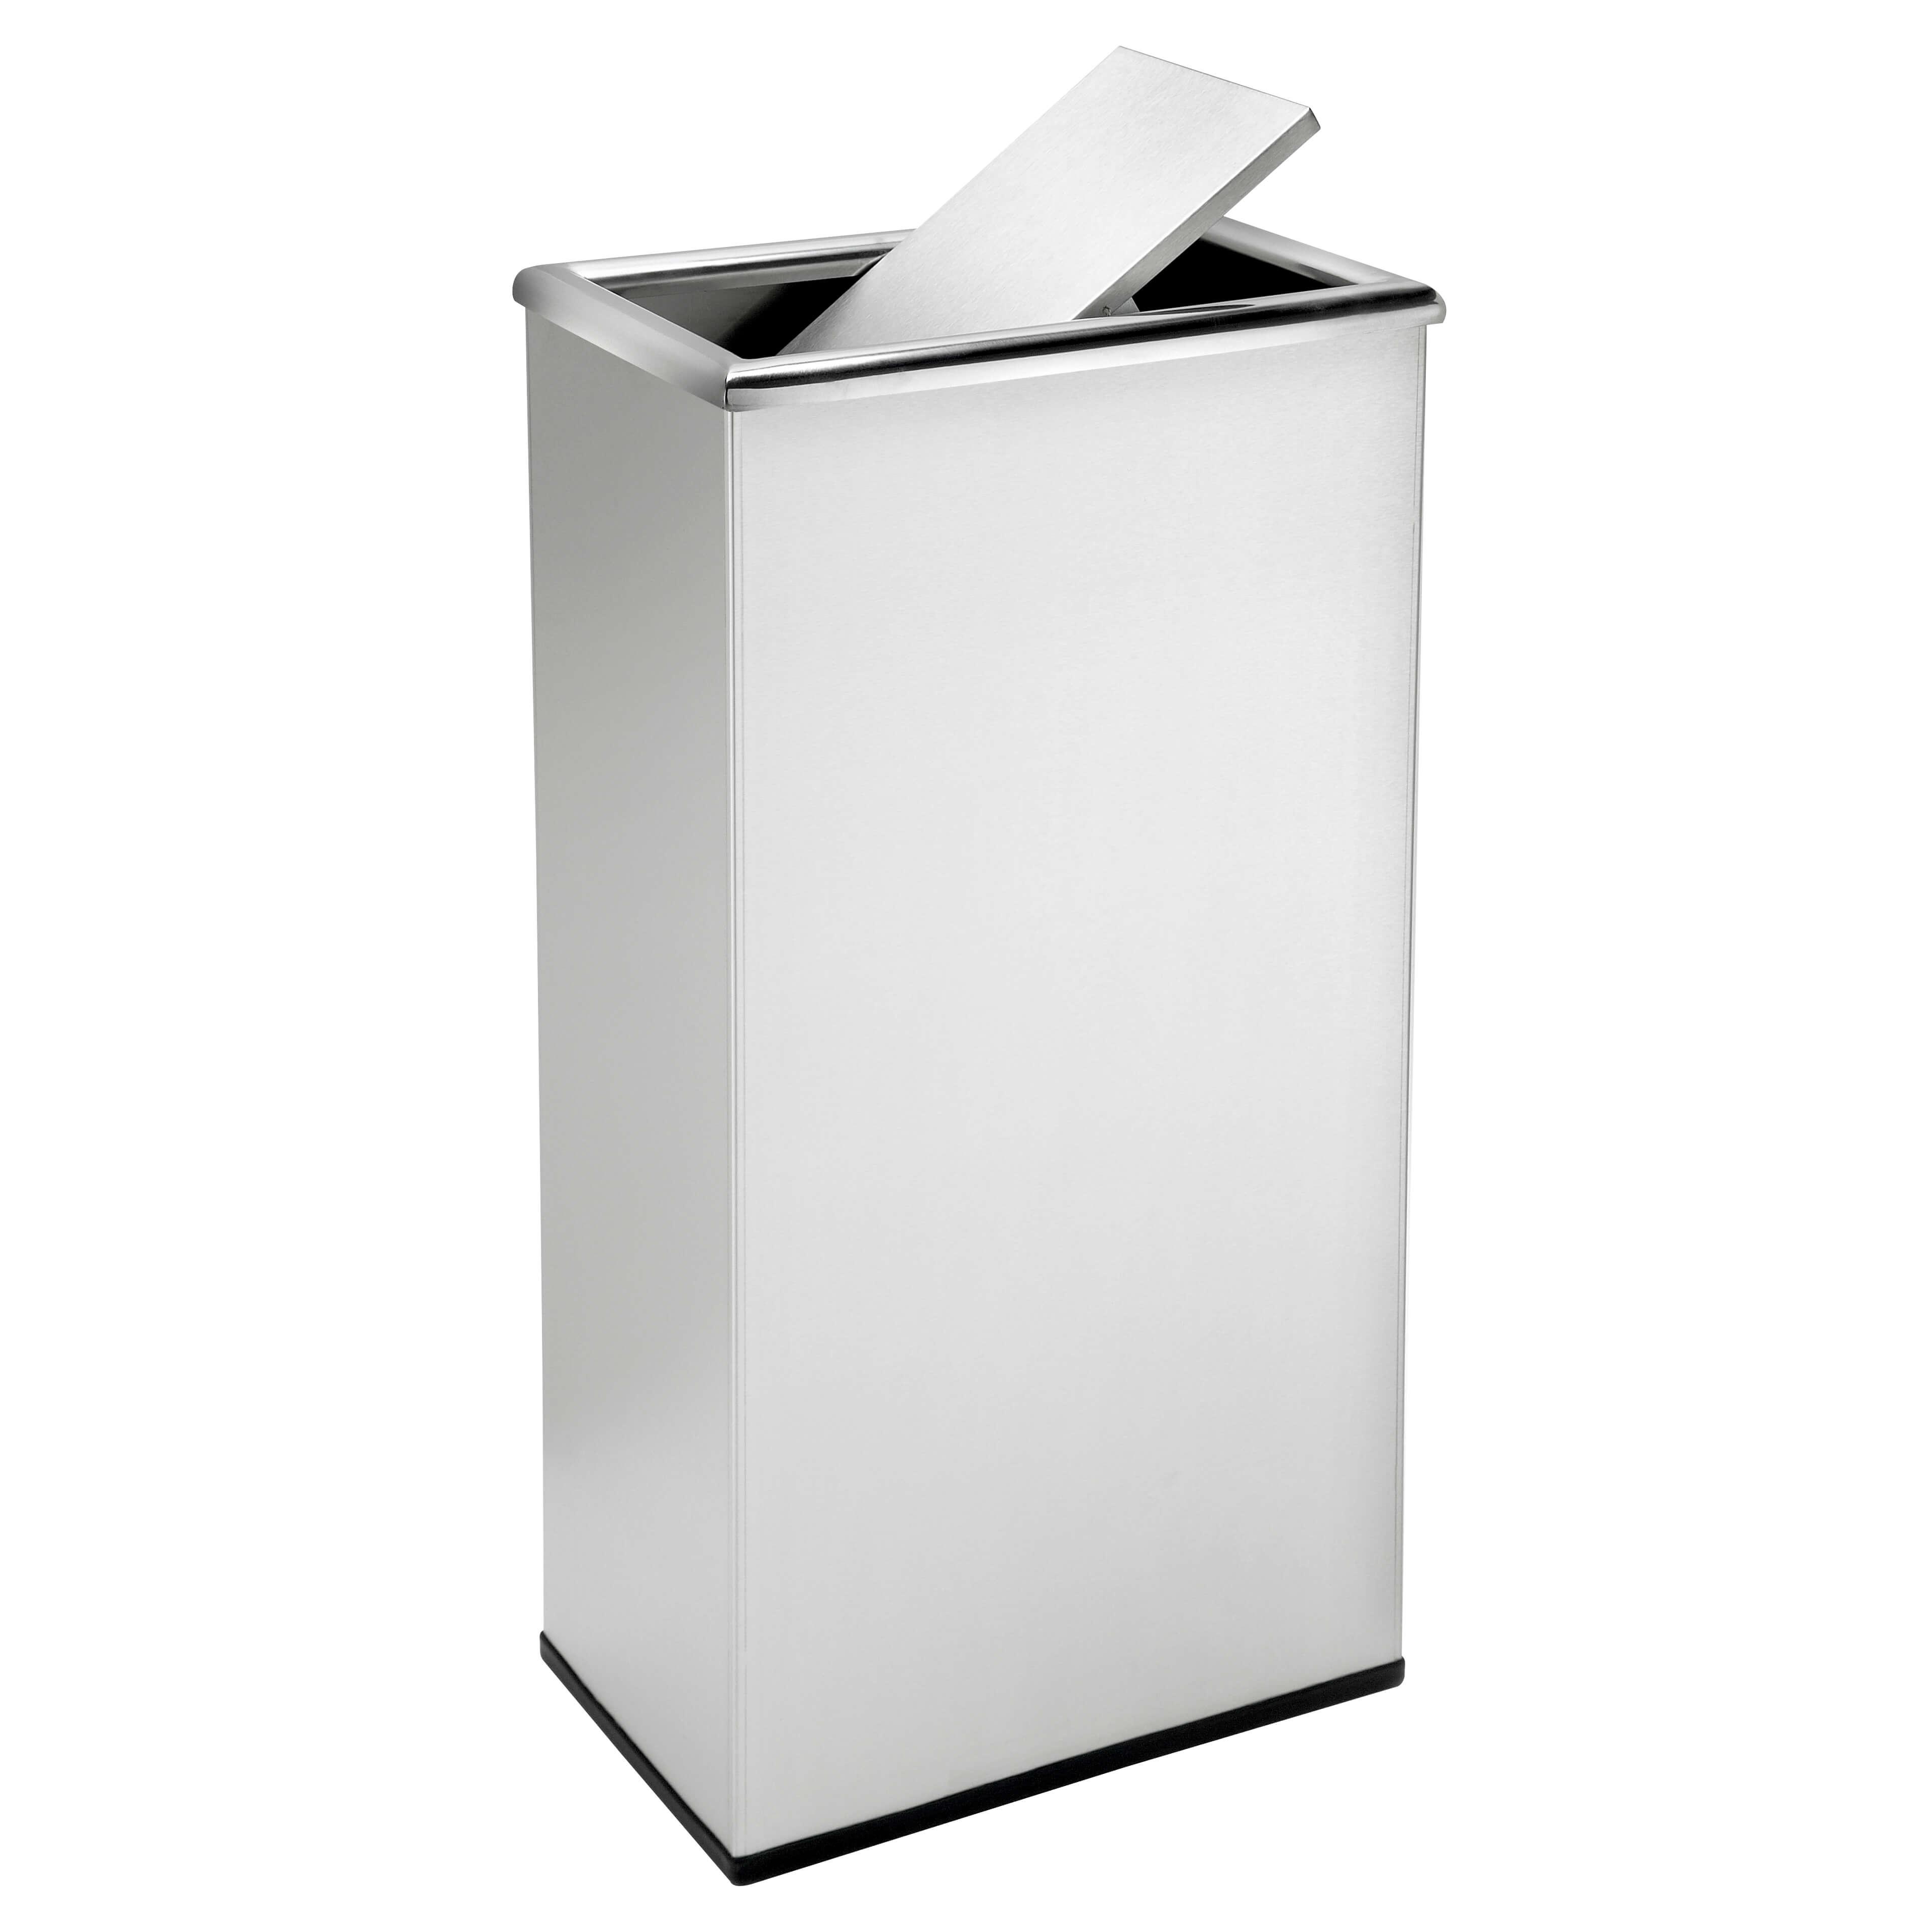 13 Gallon Steel Trash Can Swivel Top Trash Can